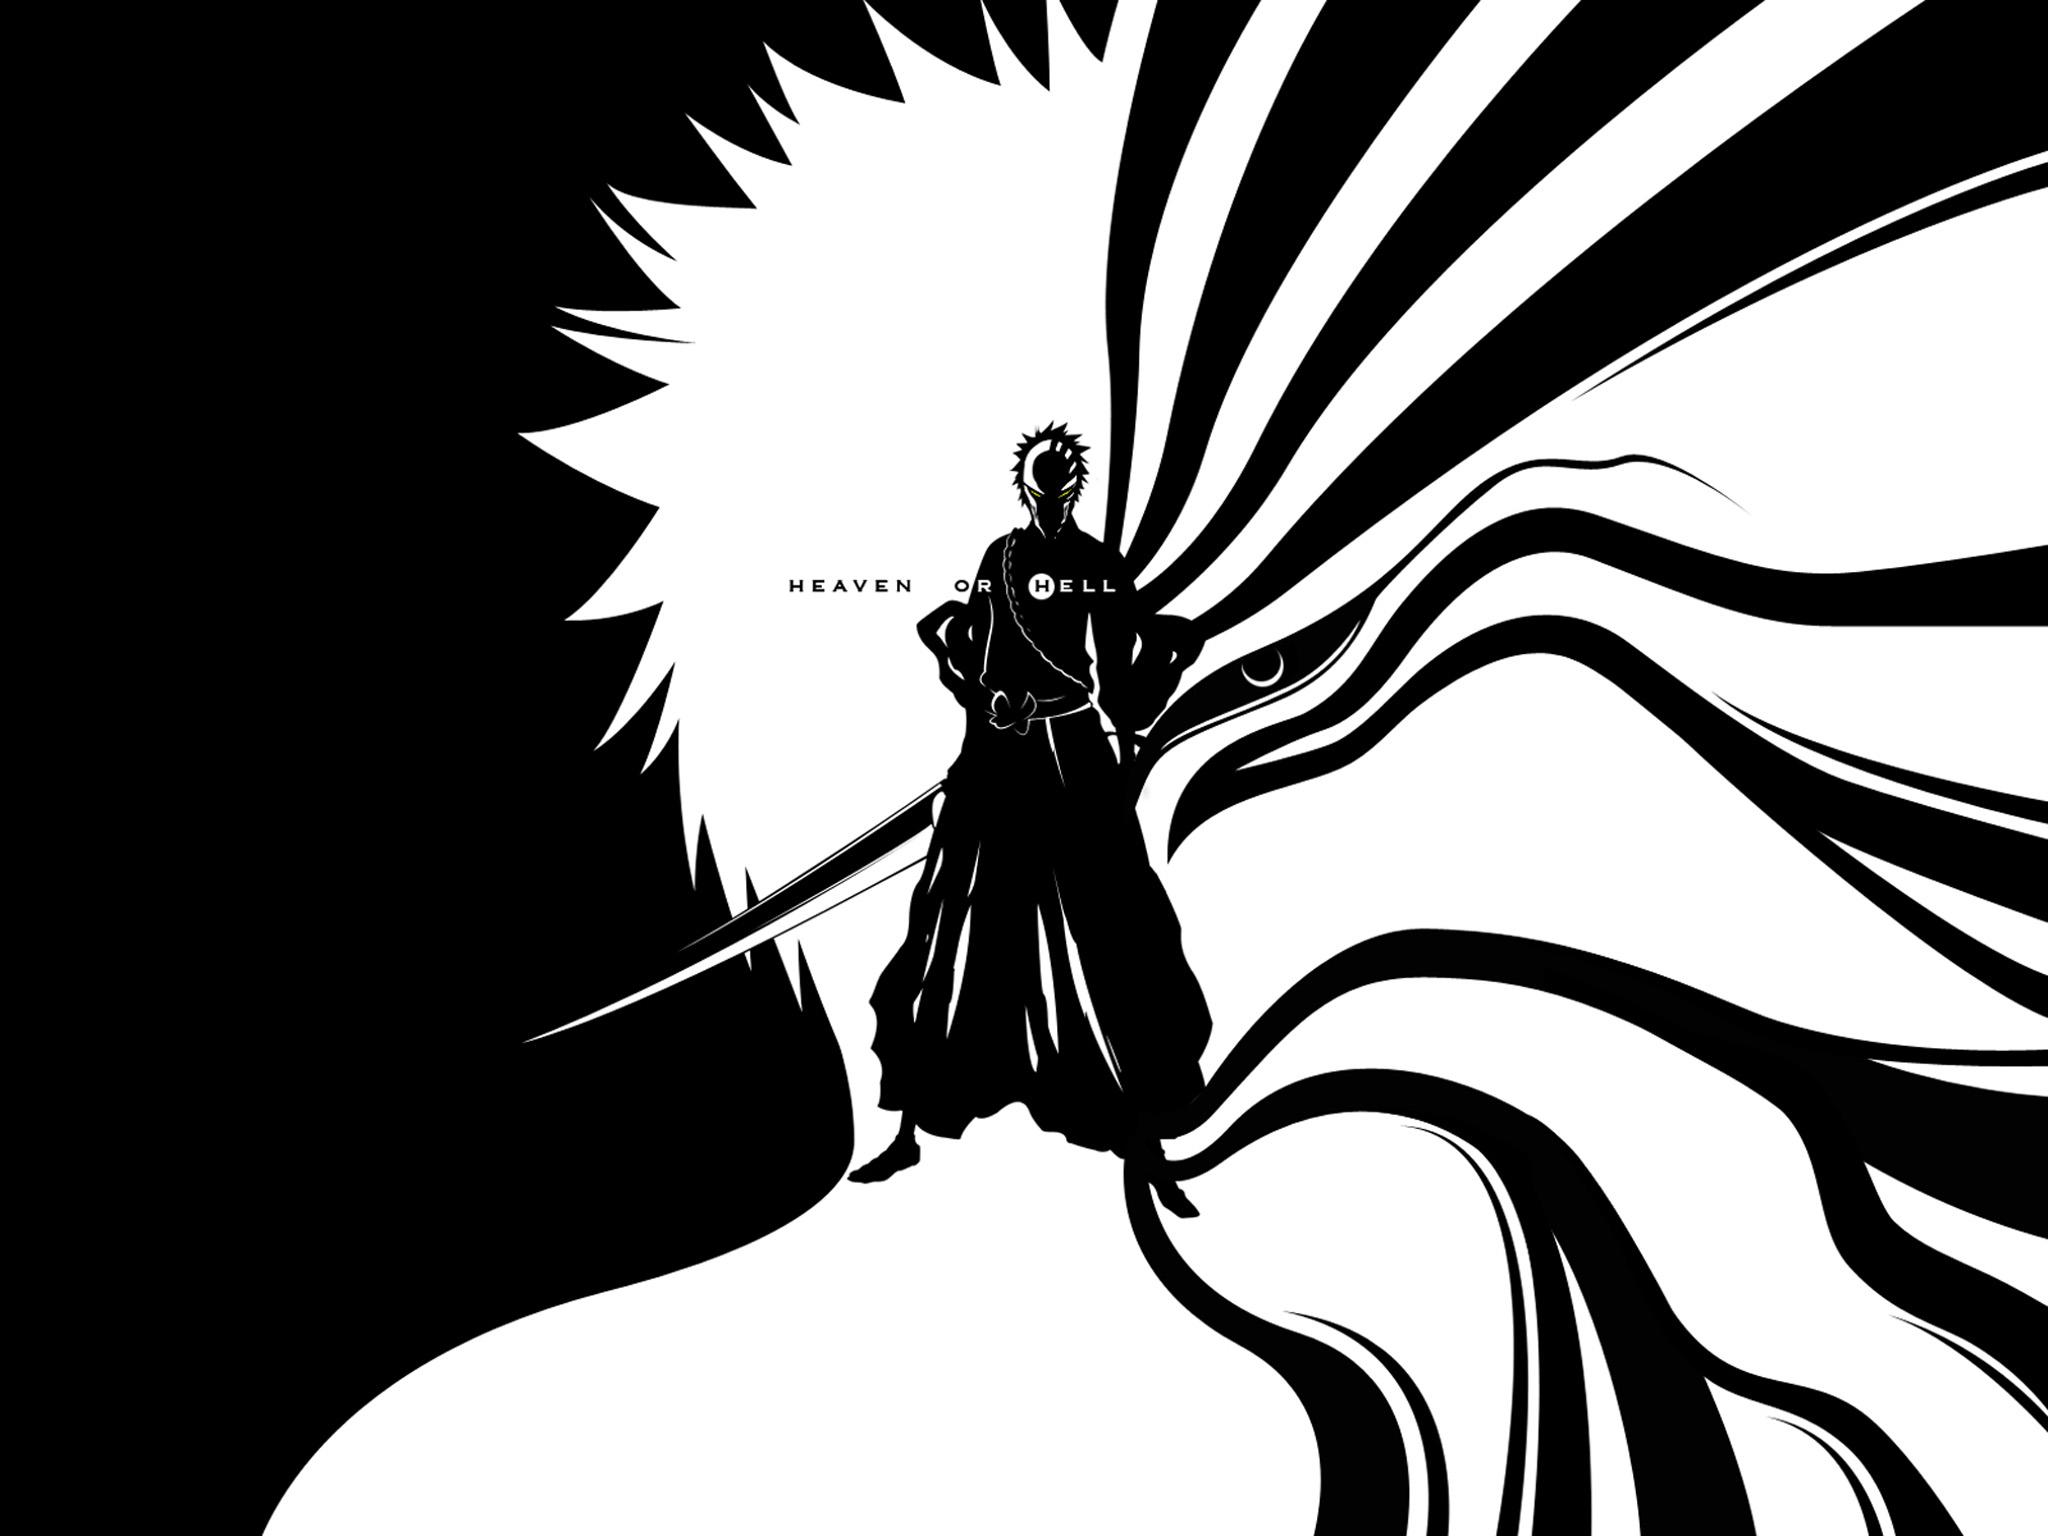 Download Bleach Ichigo Kurosaki Hollow Wallpaper Full 2048x1536